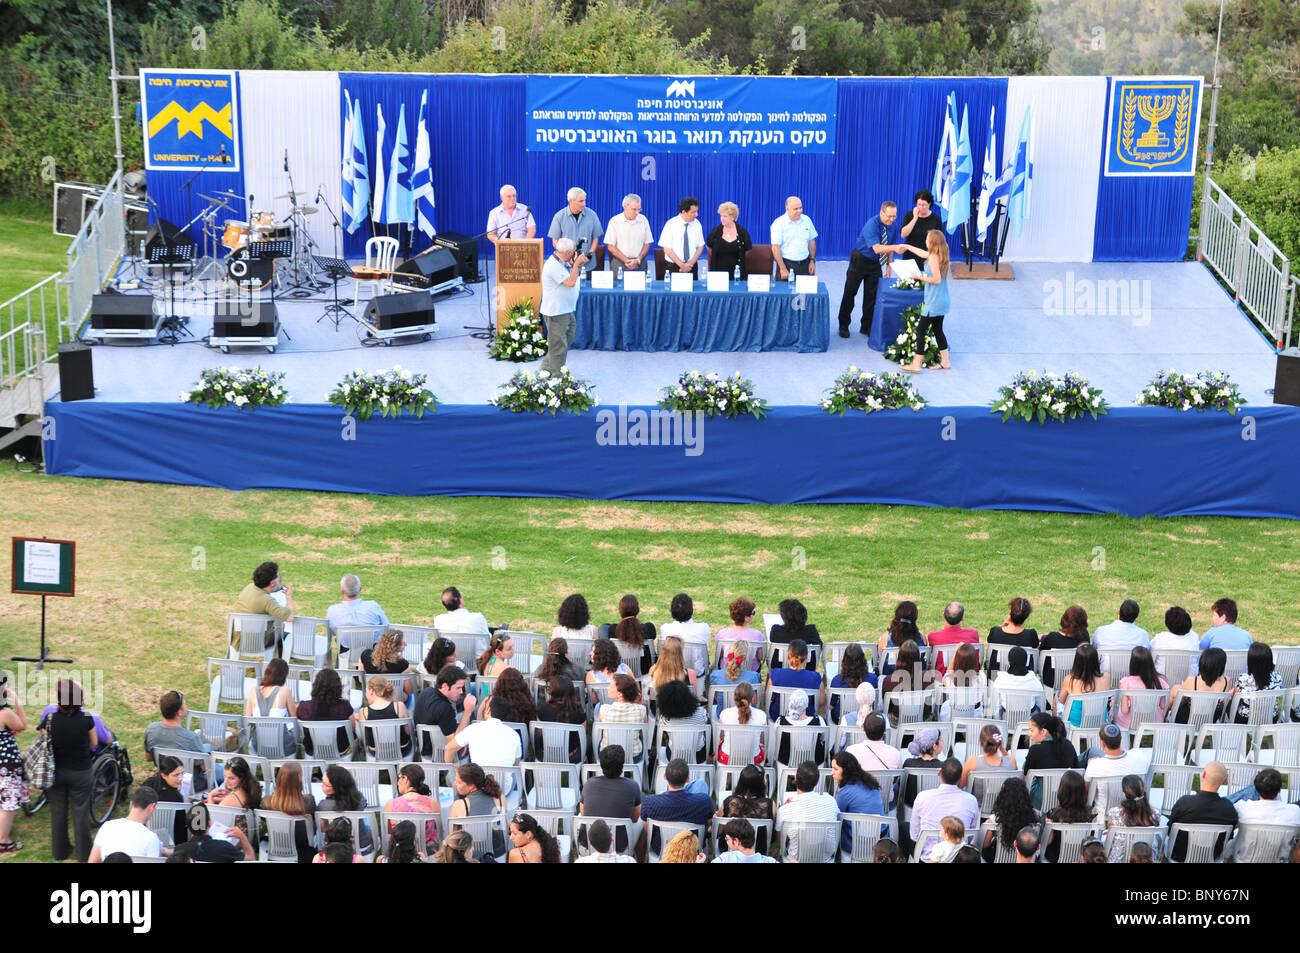 Israel, Haifa, The alumni and faculty members of the Haifa university during the graduation ceremony. June 2010 - Stock Image